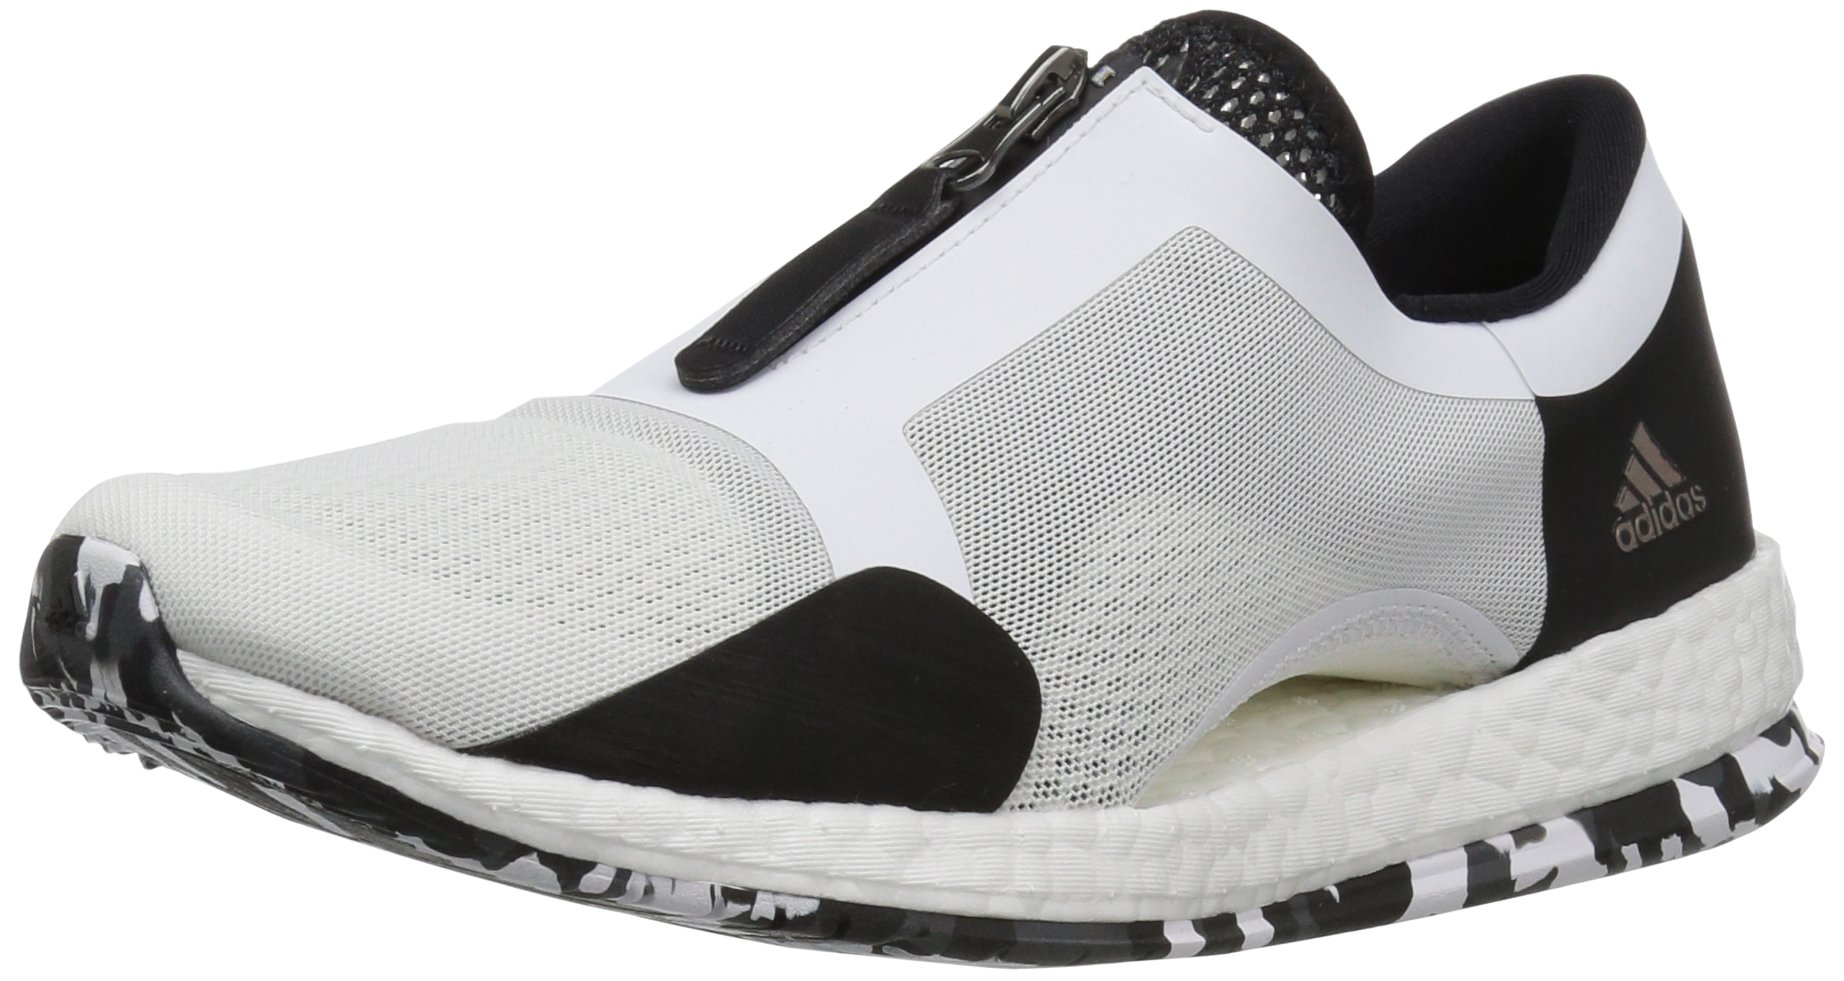 pretty nice 014ba 2eac7 adidas Women's Pure Boost X TR Zip Cross-Trainer Shoes White/Black/Dark  Grey Heather (9.5 M US)